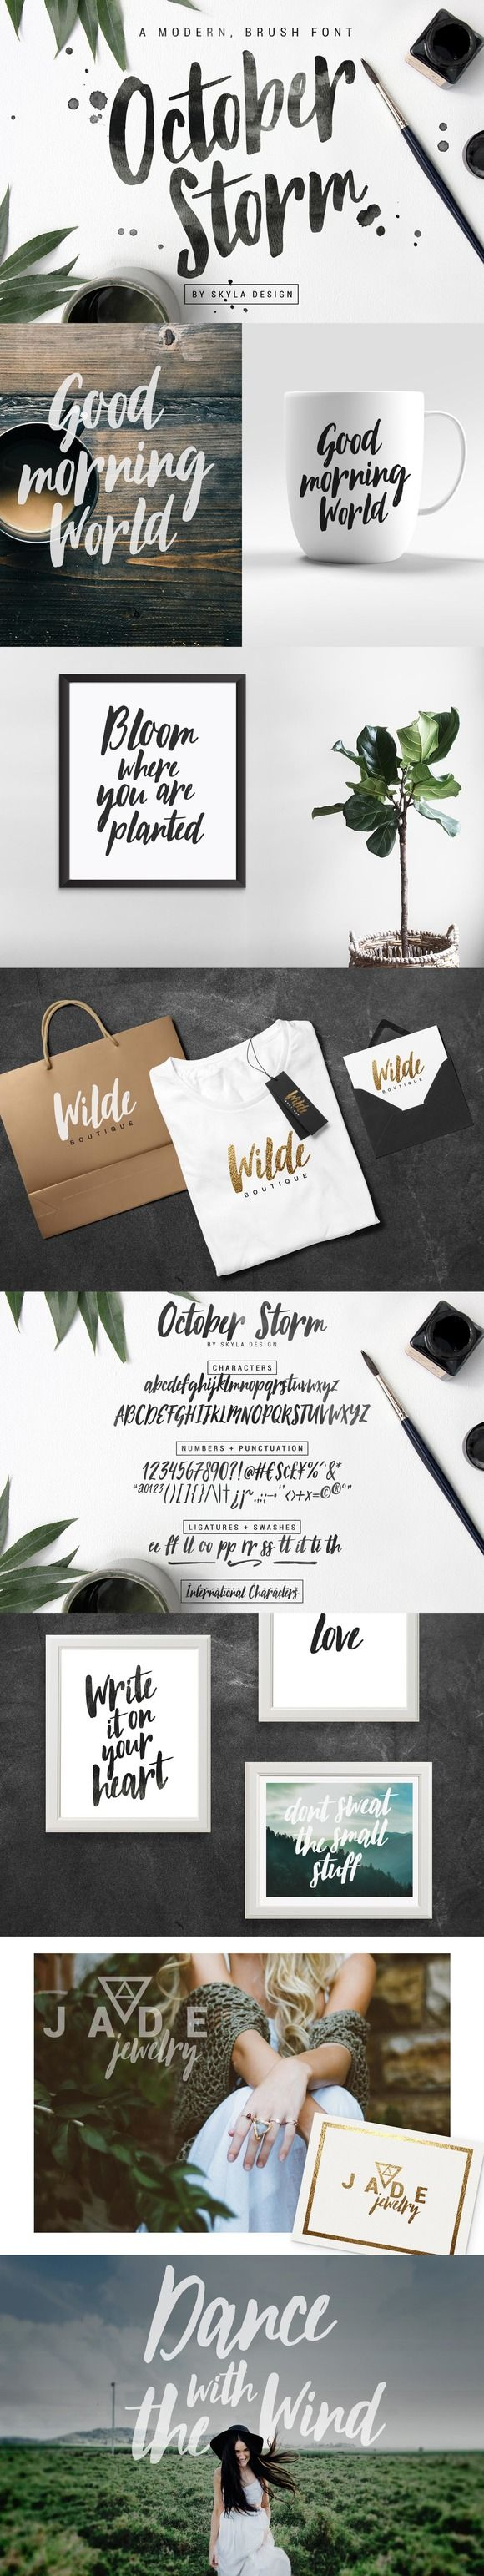 Modern brush font - October Storm by skyladesign on @creativemarket                                                                                                                                                     More